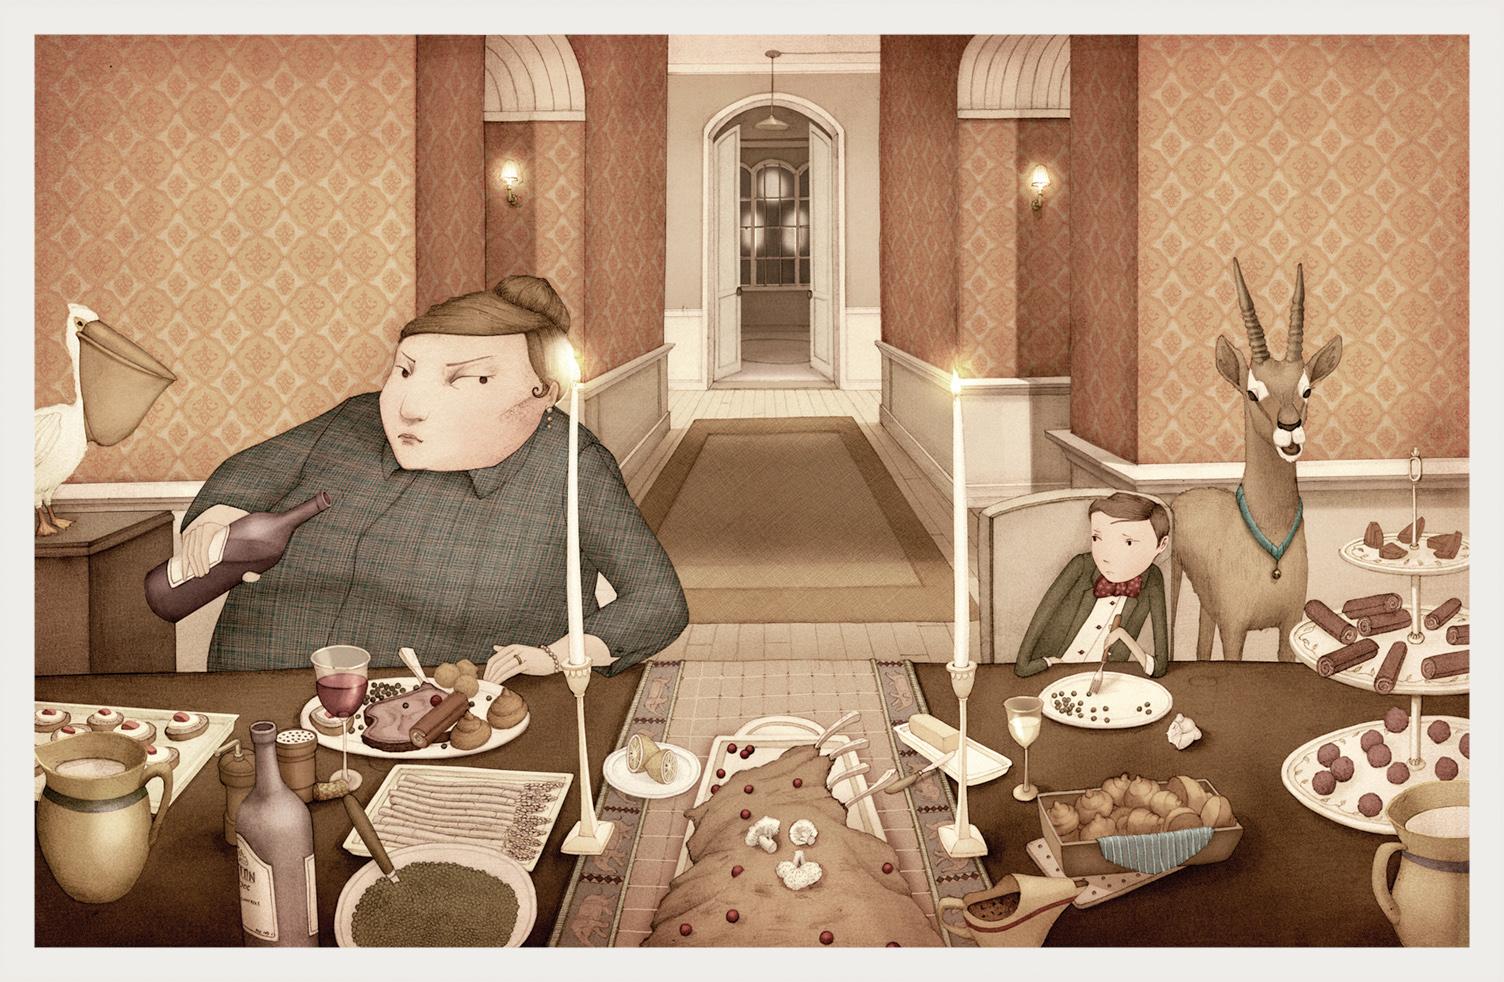 Nicholas Gannon / The Doldrums / Dinner Party